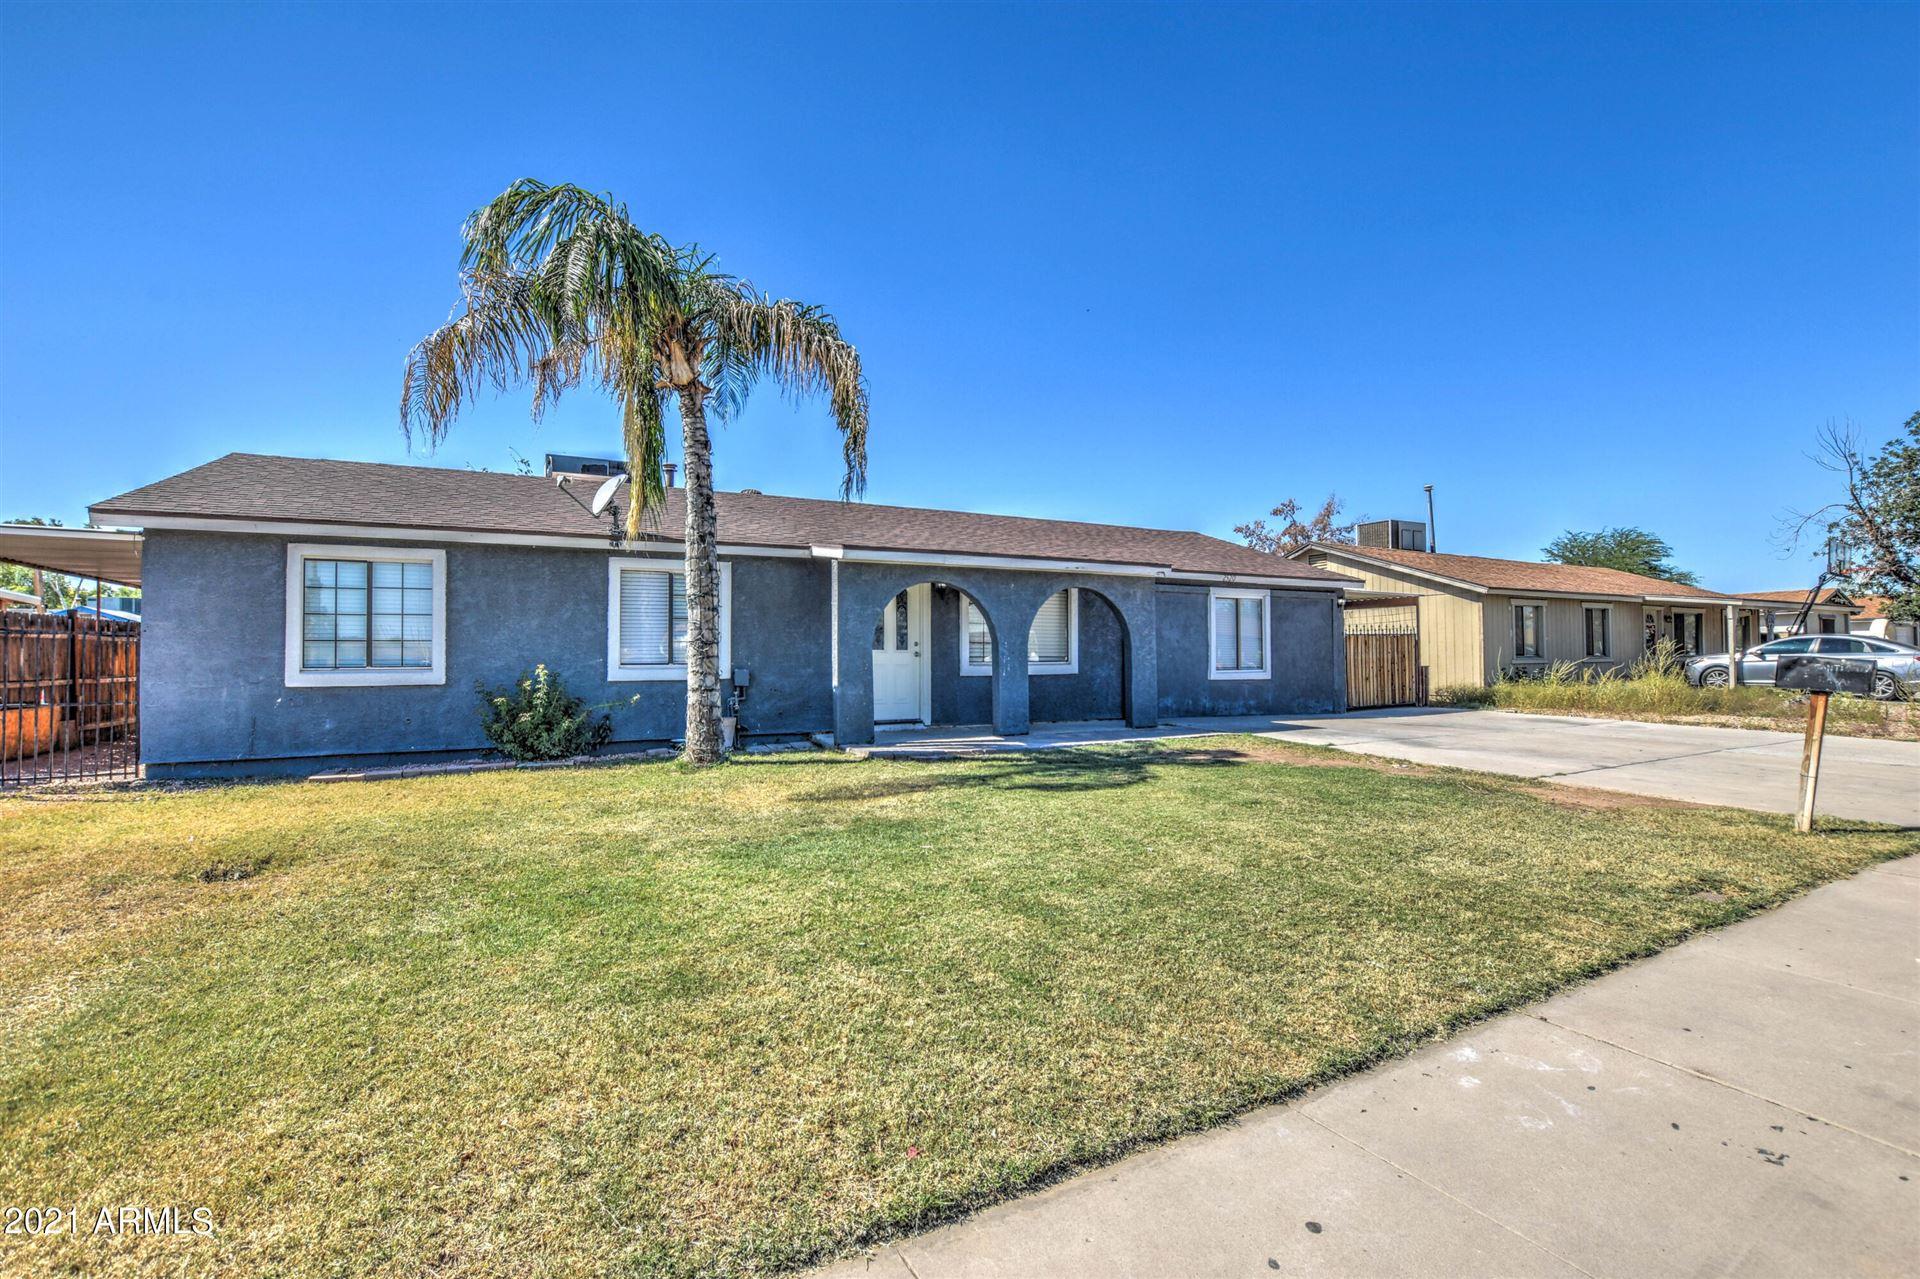 Photo of 2520 N 61ST Avenue, Phoenix, AZ 85035 (MLS # 6307845)